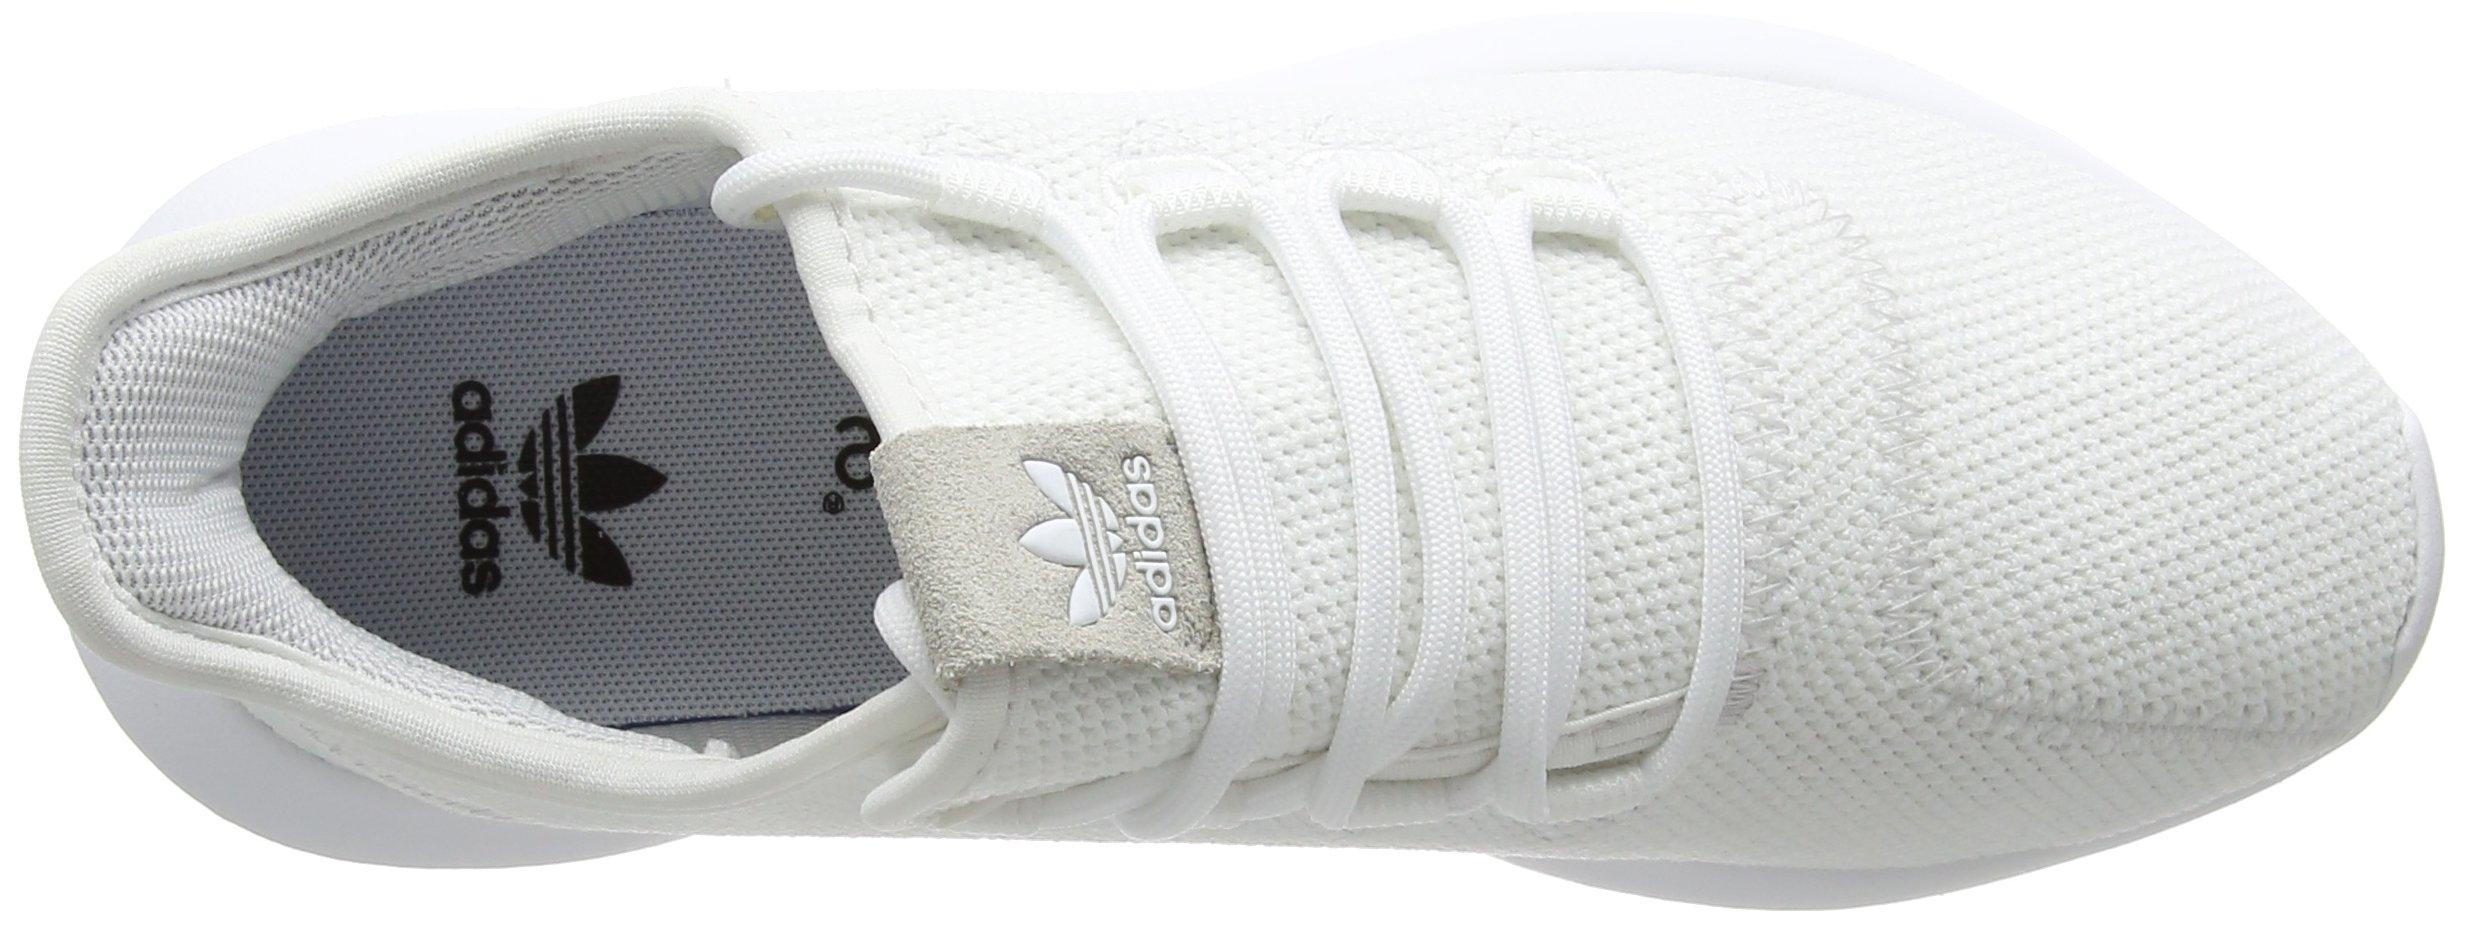 new arrival b8c33 65bf3 adidas Tubular Shadow, Scarpe da Ginnastica Unisex-Bambini